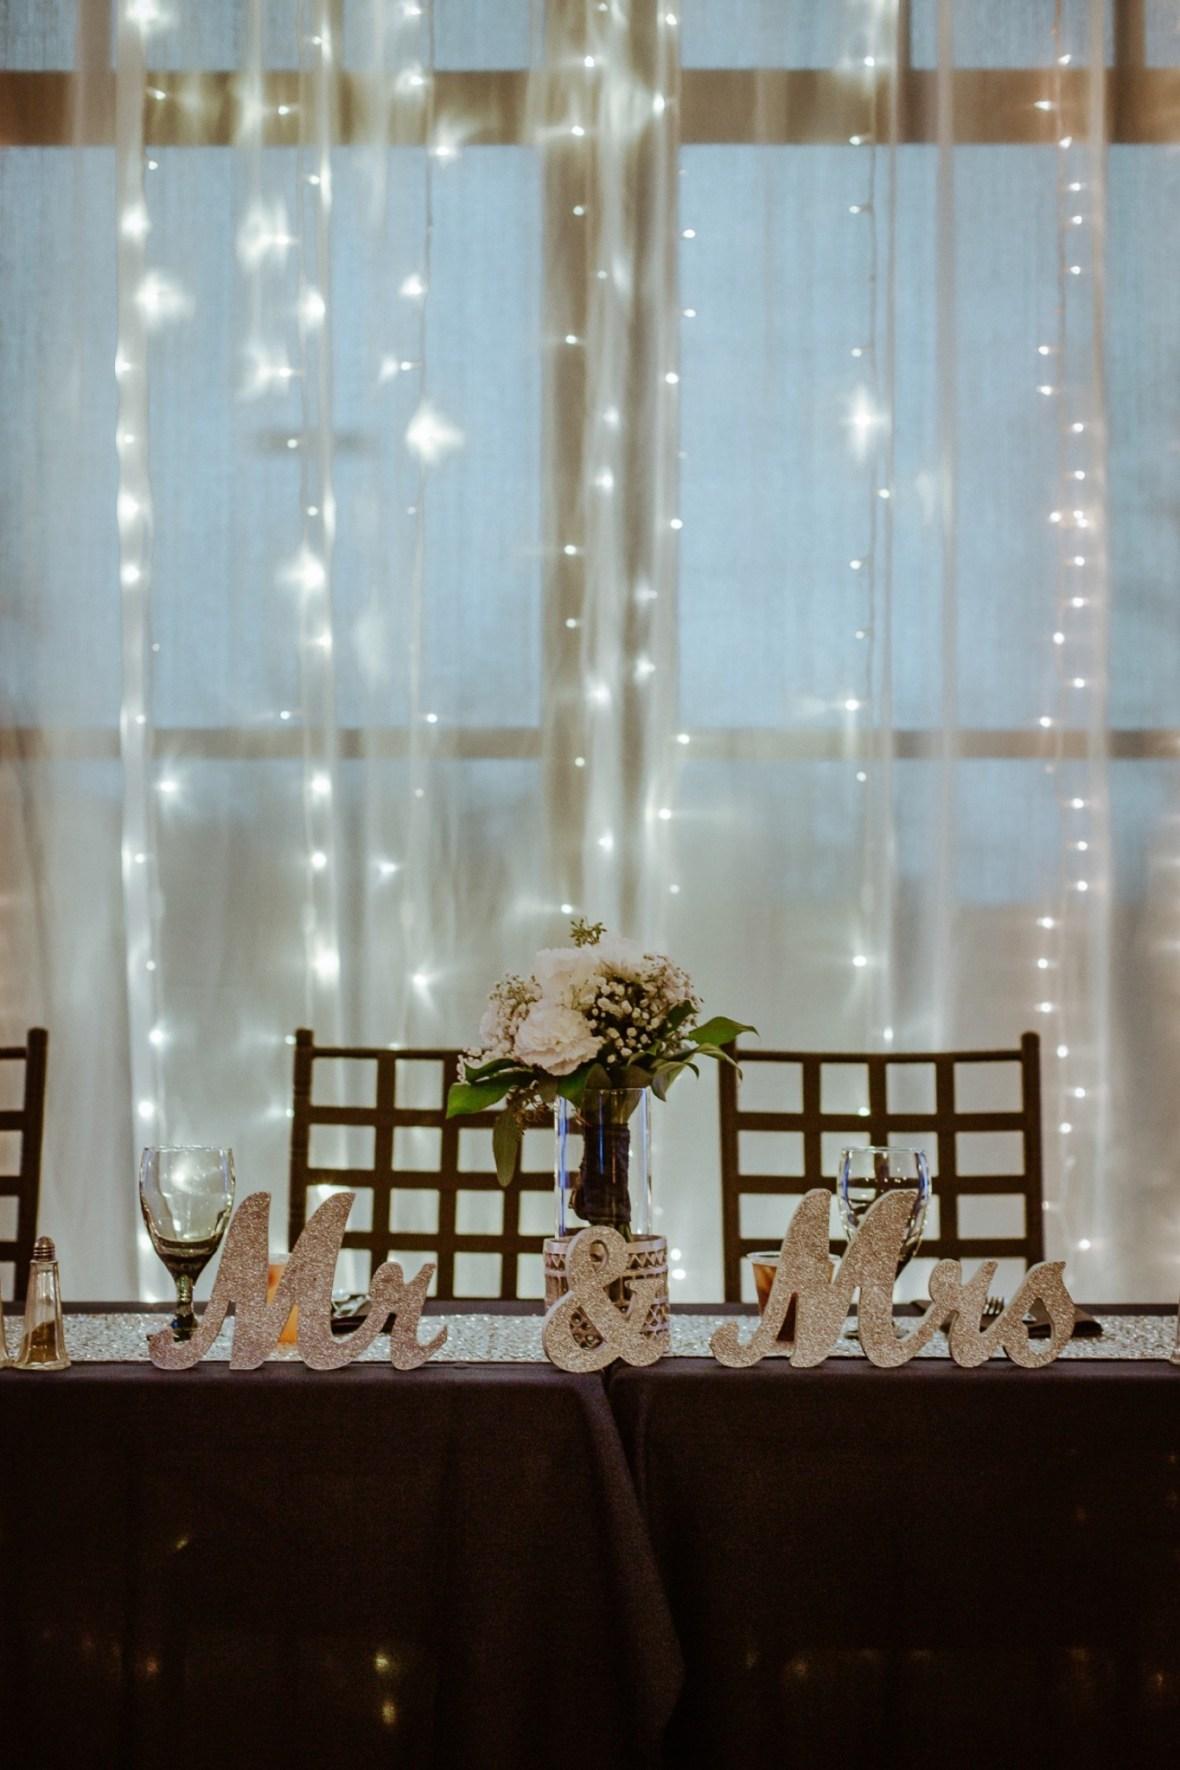 074_WCTM6957ab_Kentucky_Noahs_Louisville_Event_Venue_Wedding